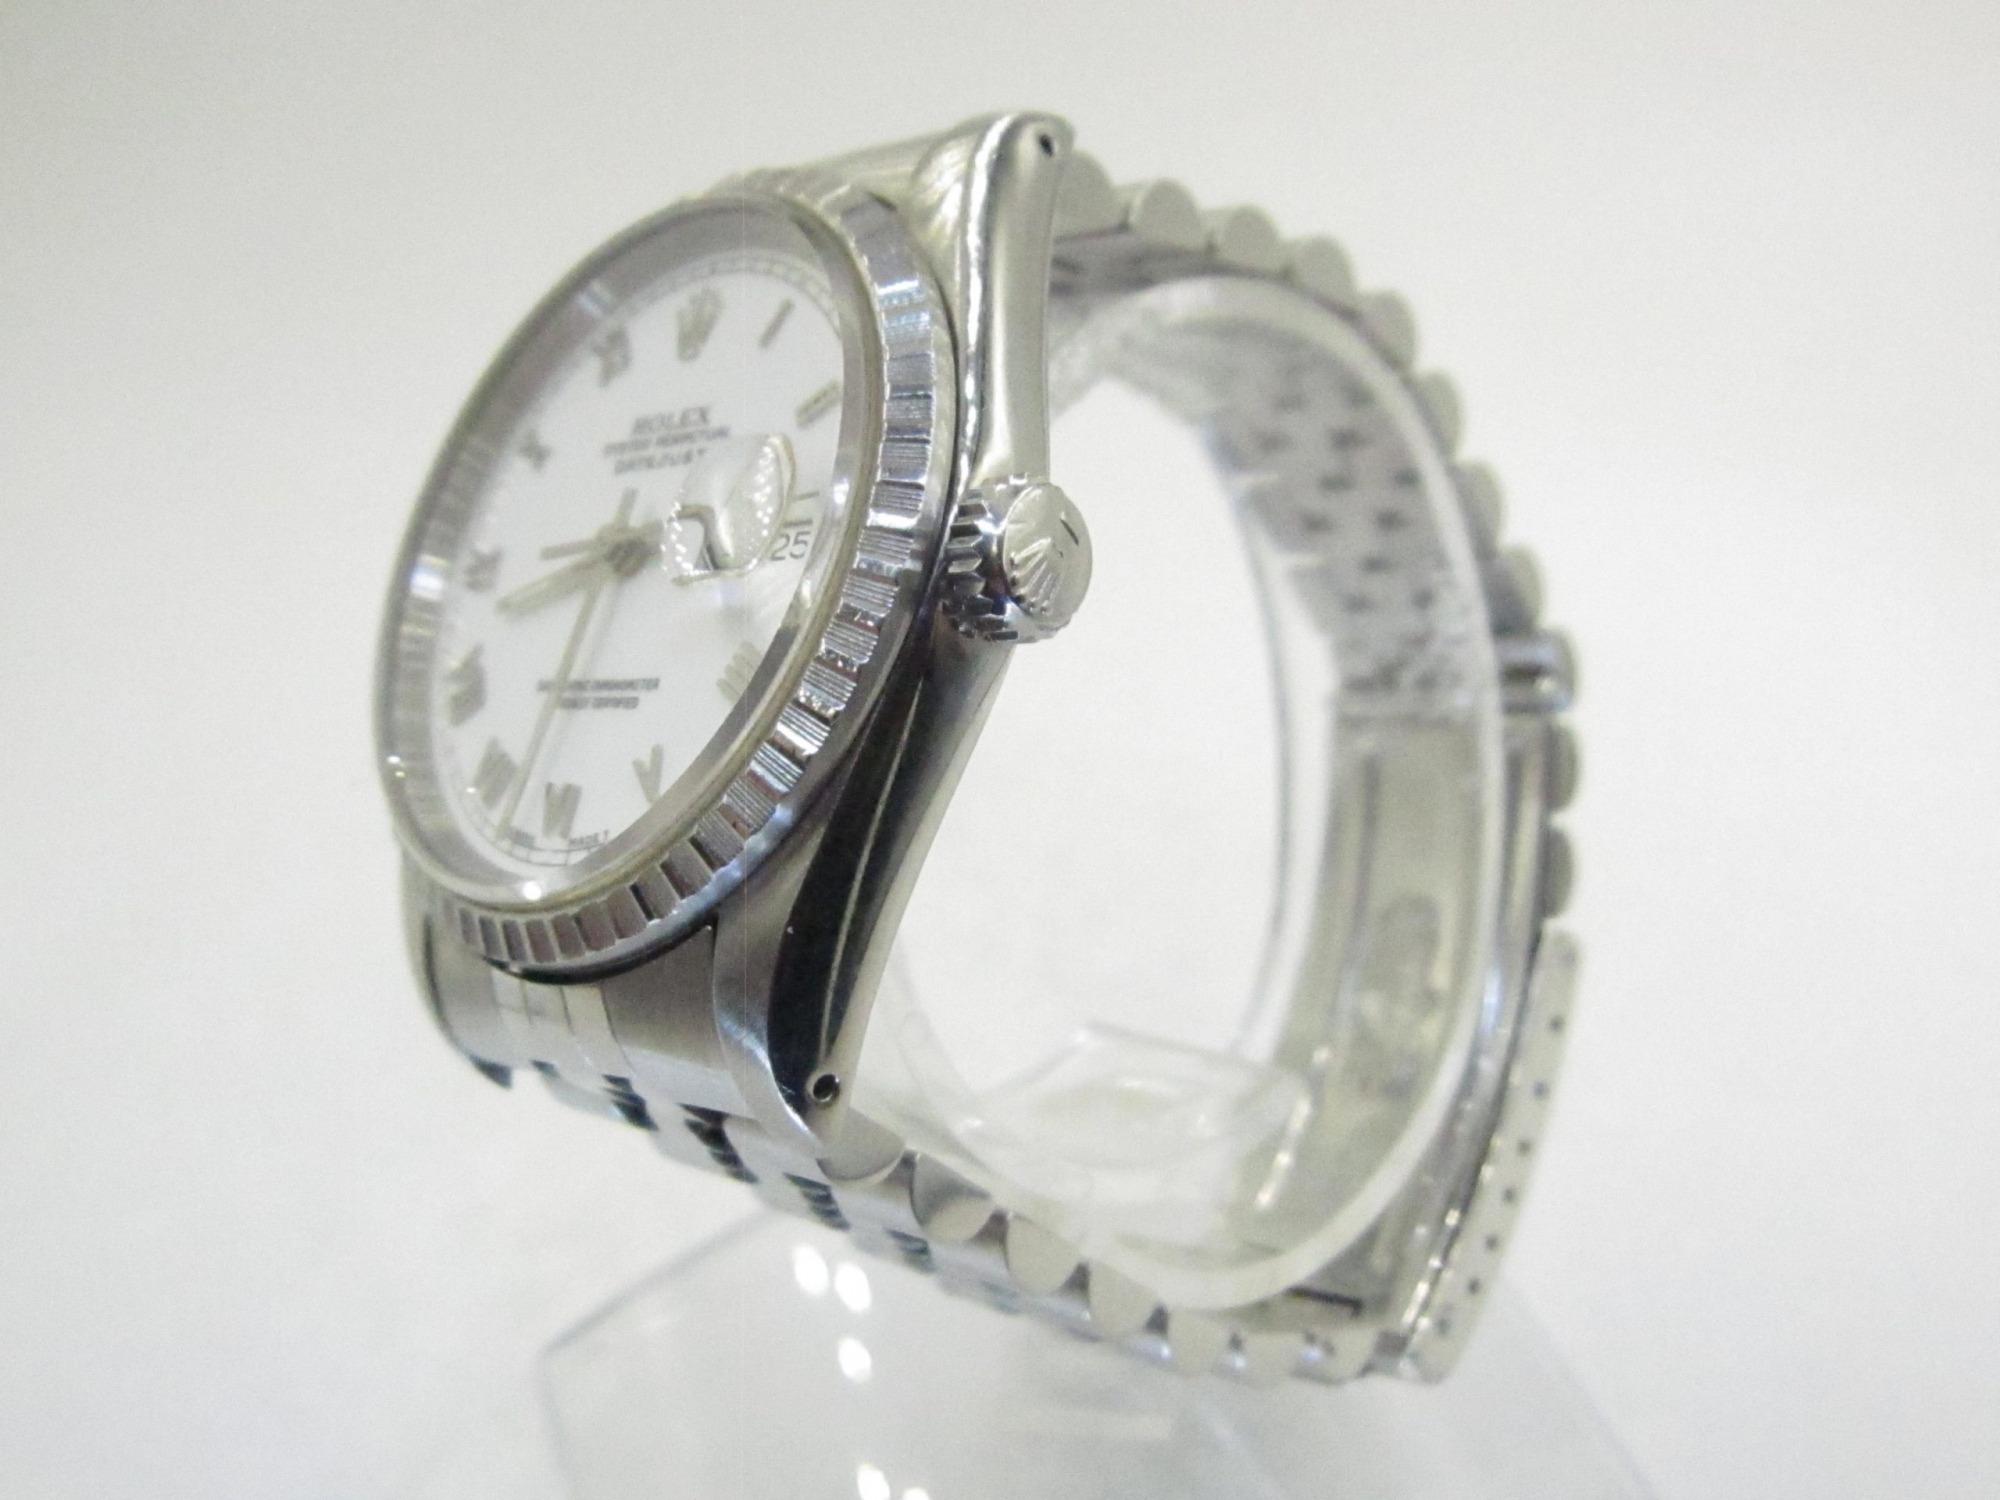 Rolex Datejust 16220 White Roman(Pre-Owned Rolex Watch)RL-370